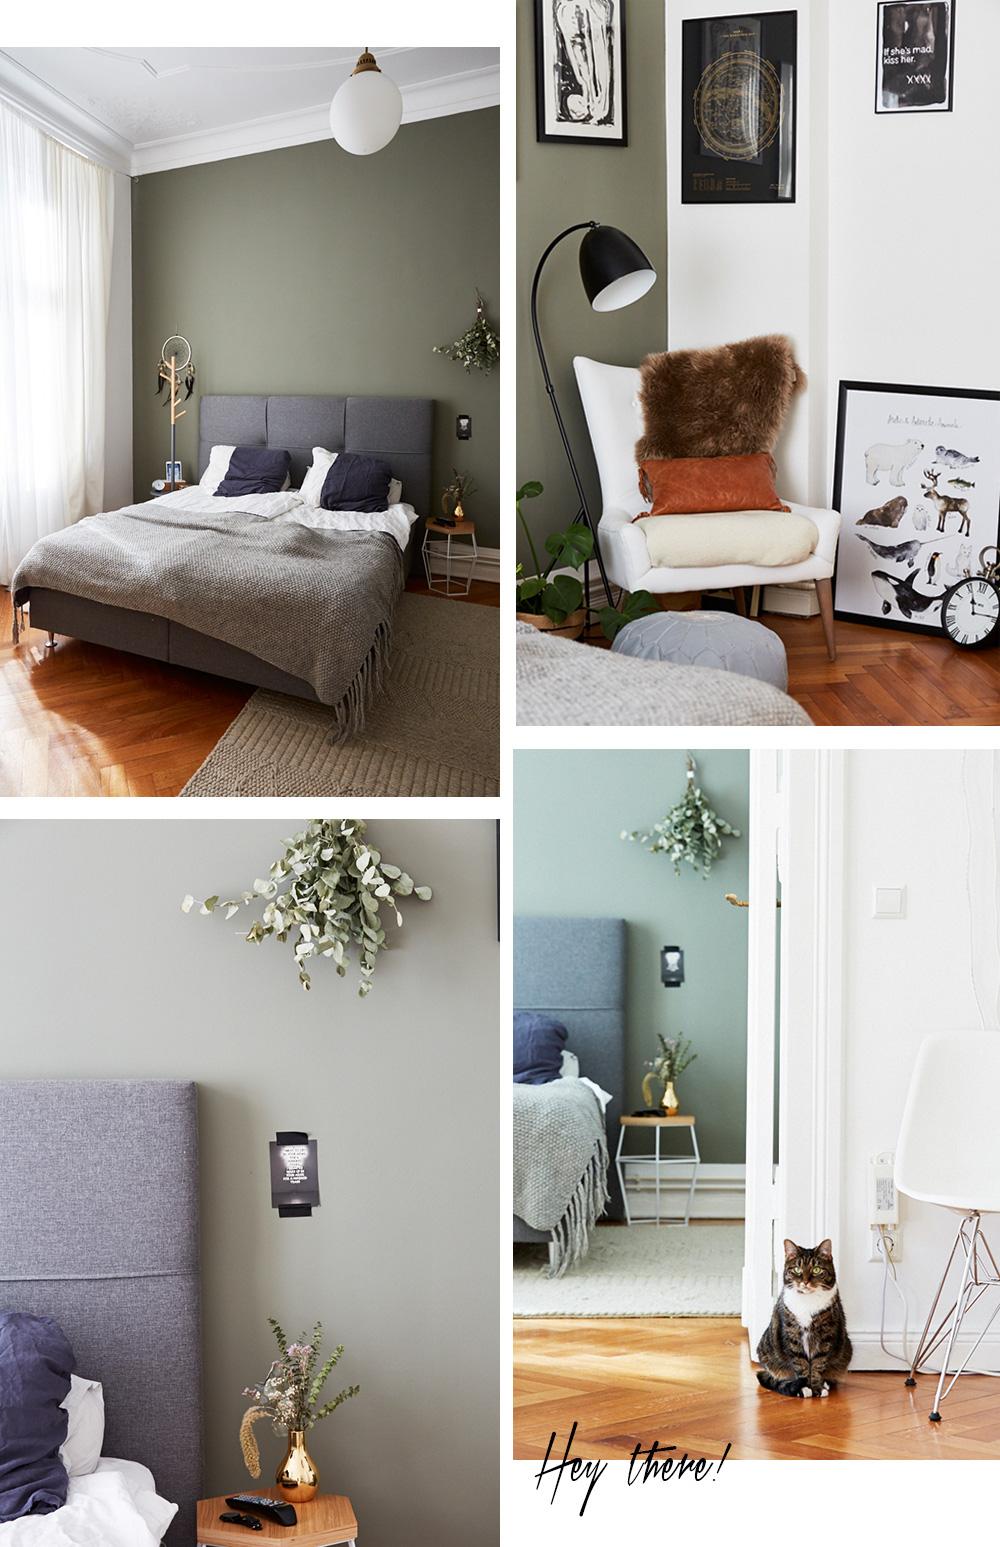 femtastics-Masha-Sedgwick-Schlafzimmer-Katze-Details